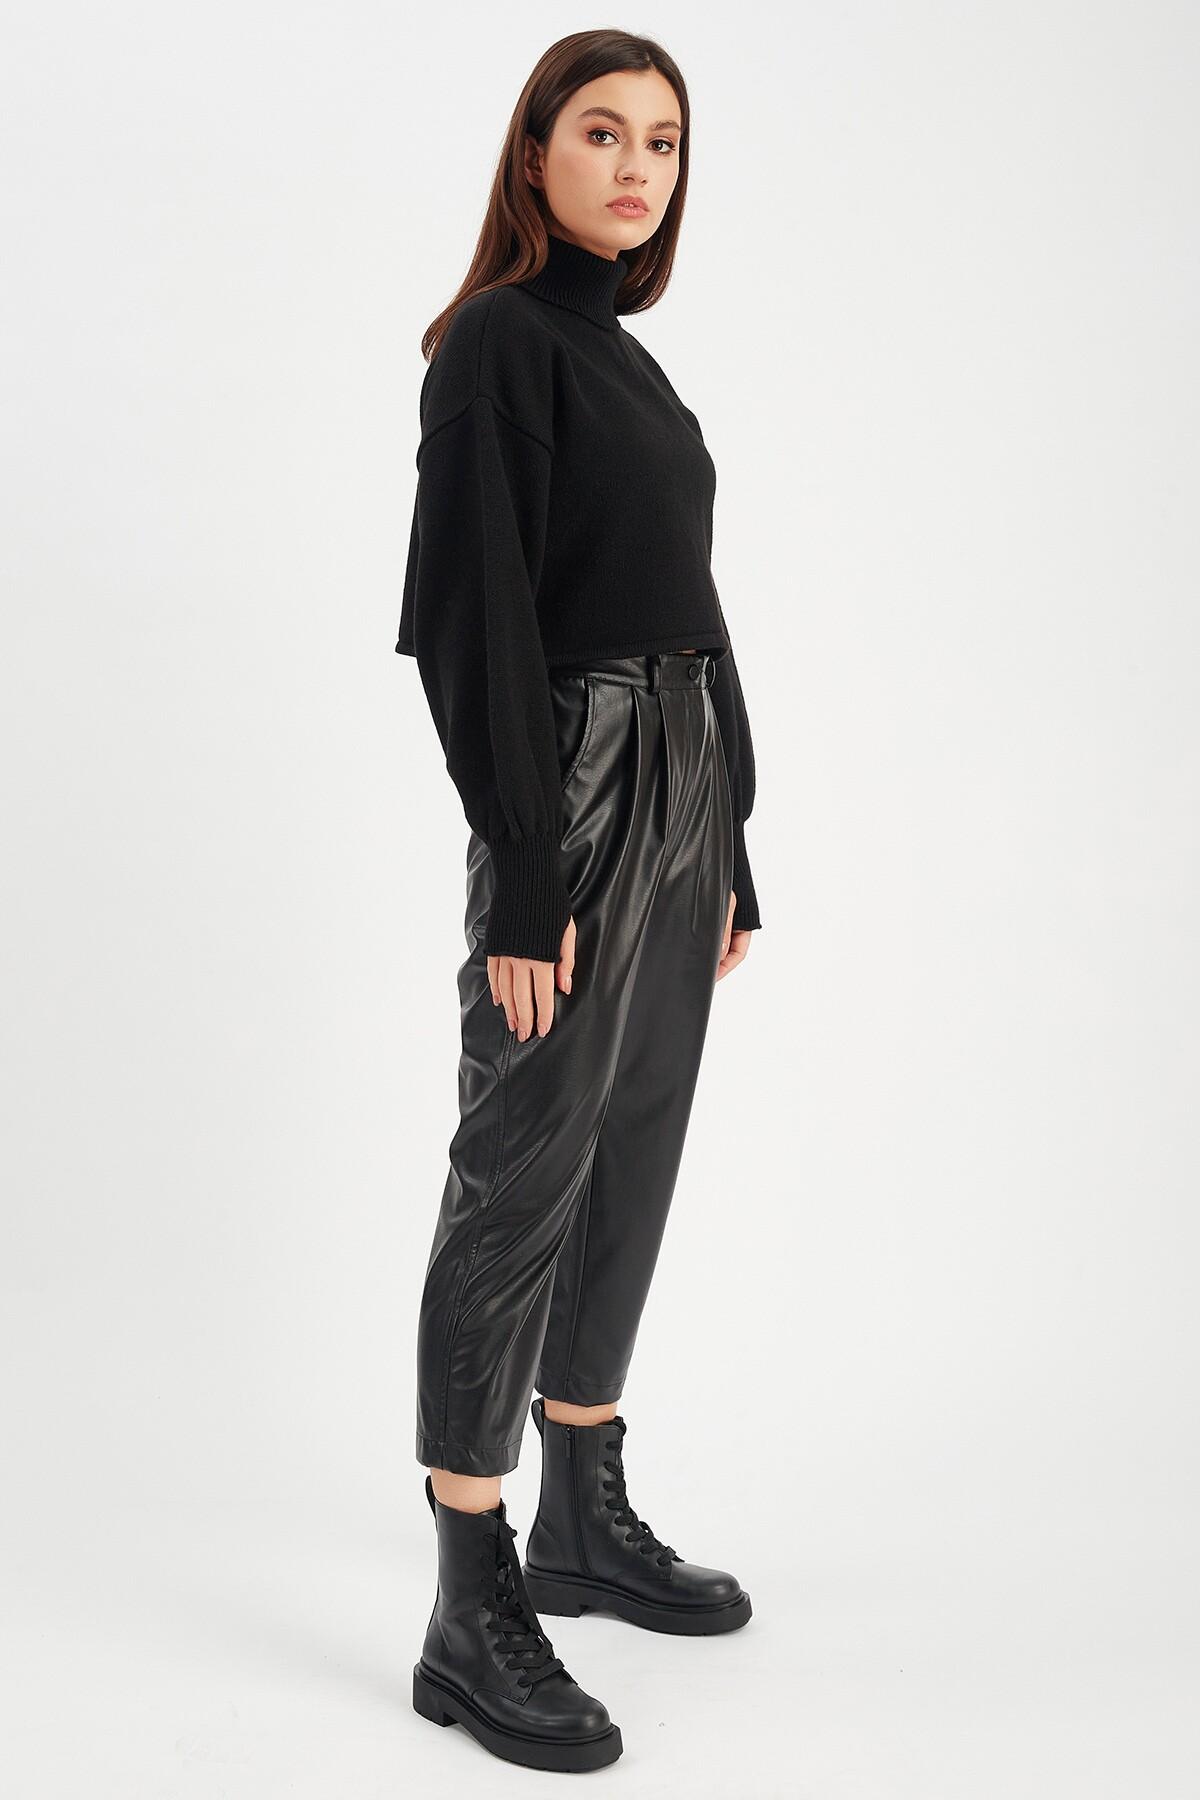 Siyah Kadın Deri Pantolon   Mk21W660108